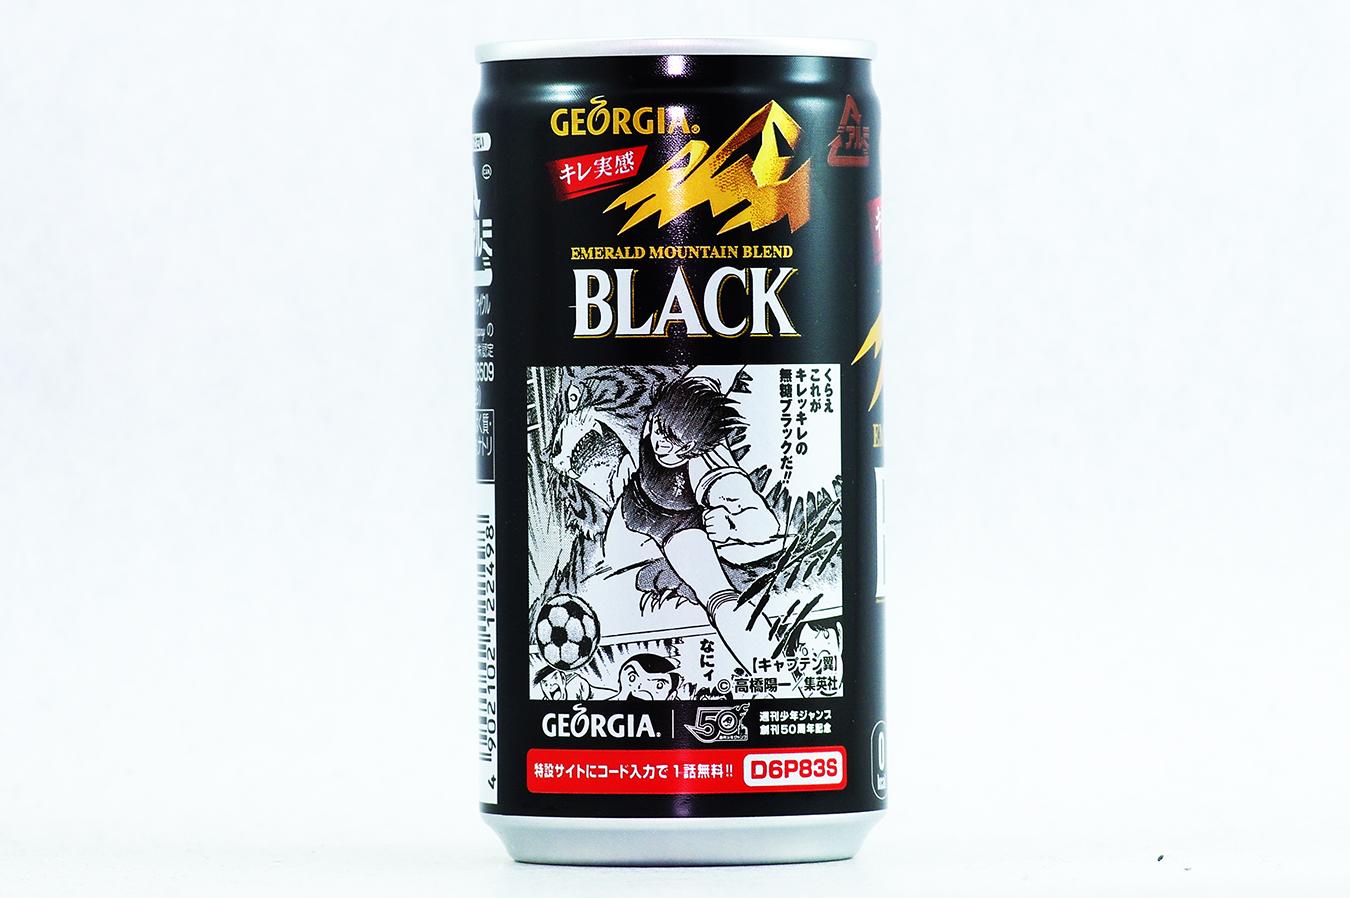 GEORGIA エメラルドマウンテンブレンド ブラック 週刊少年ジャンプ創刊50周年記念缶【キャプテン翼】 裏面 2018年5月